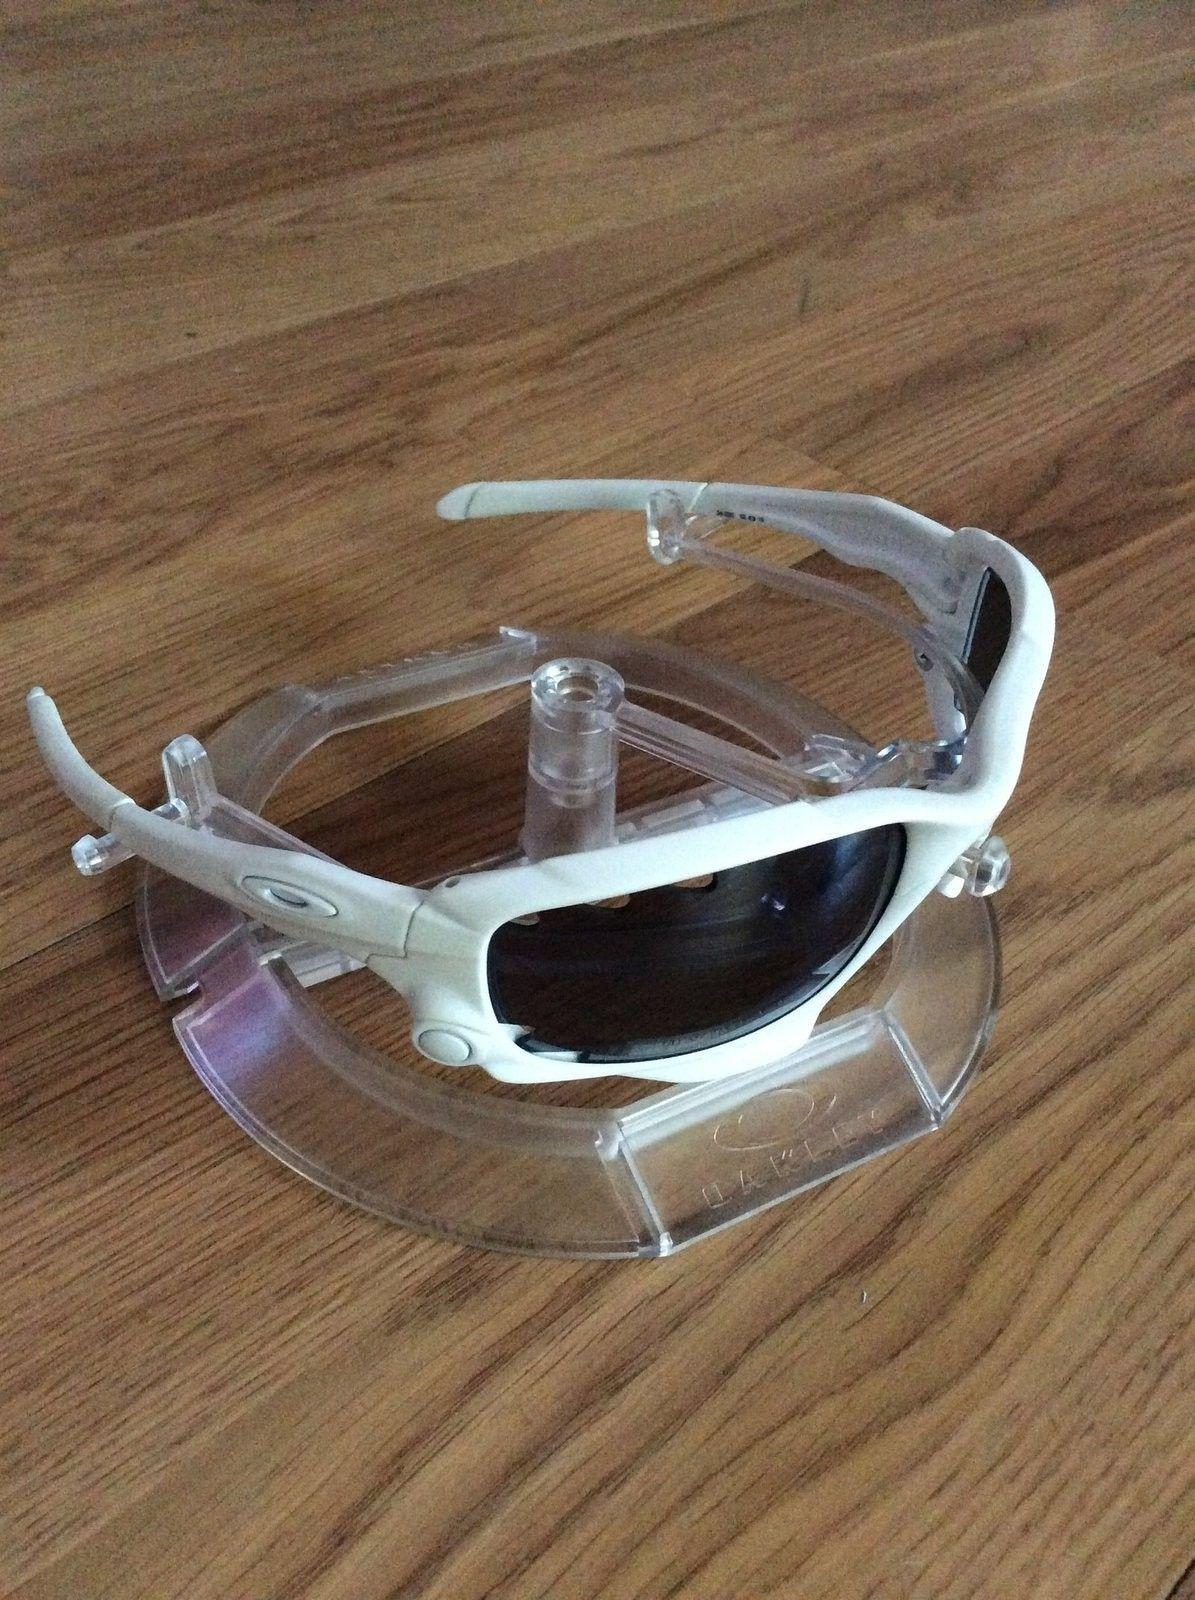 NWOB Stapl Jawbone $125 shipped - image.jpg